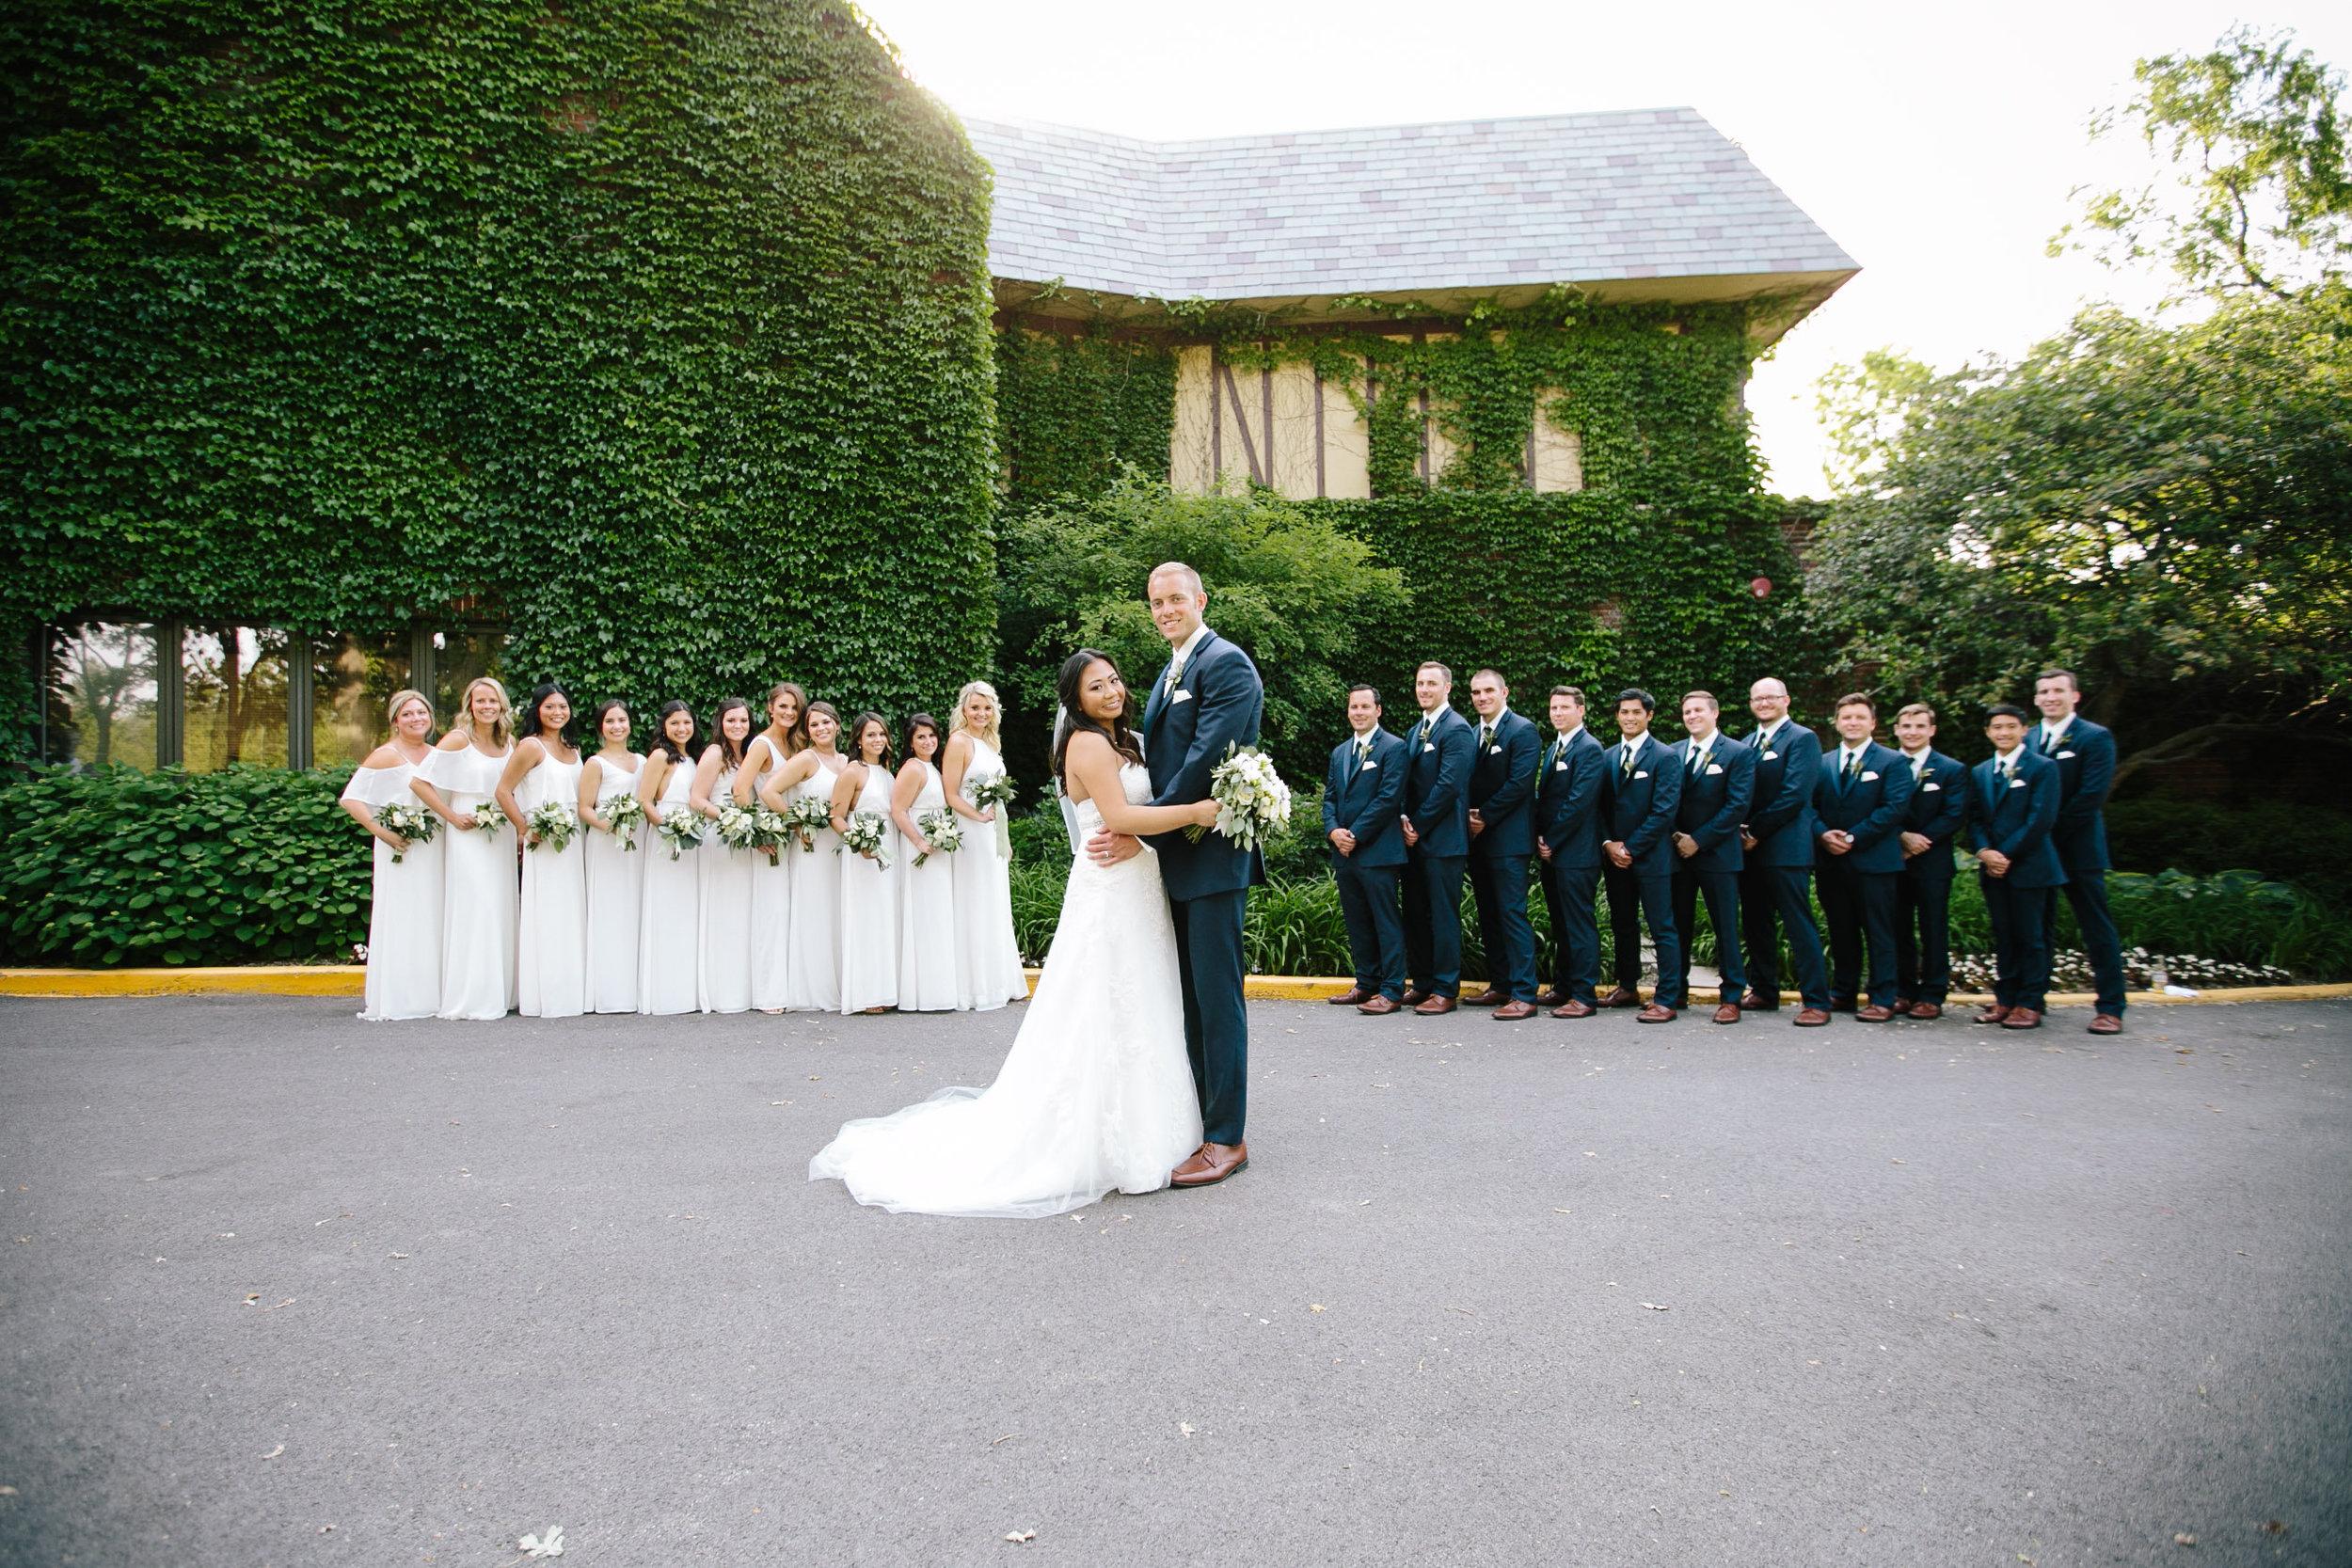 07 - Bridal Party-0631.jpg